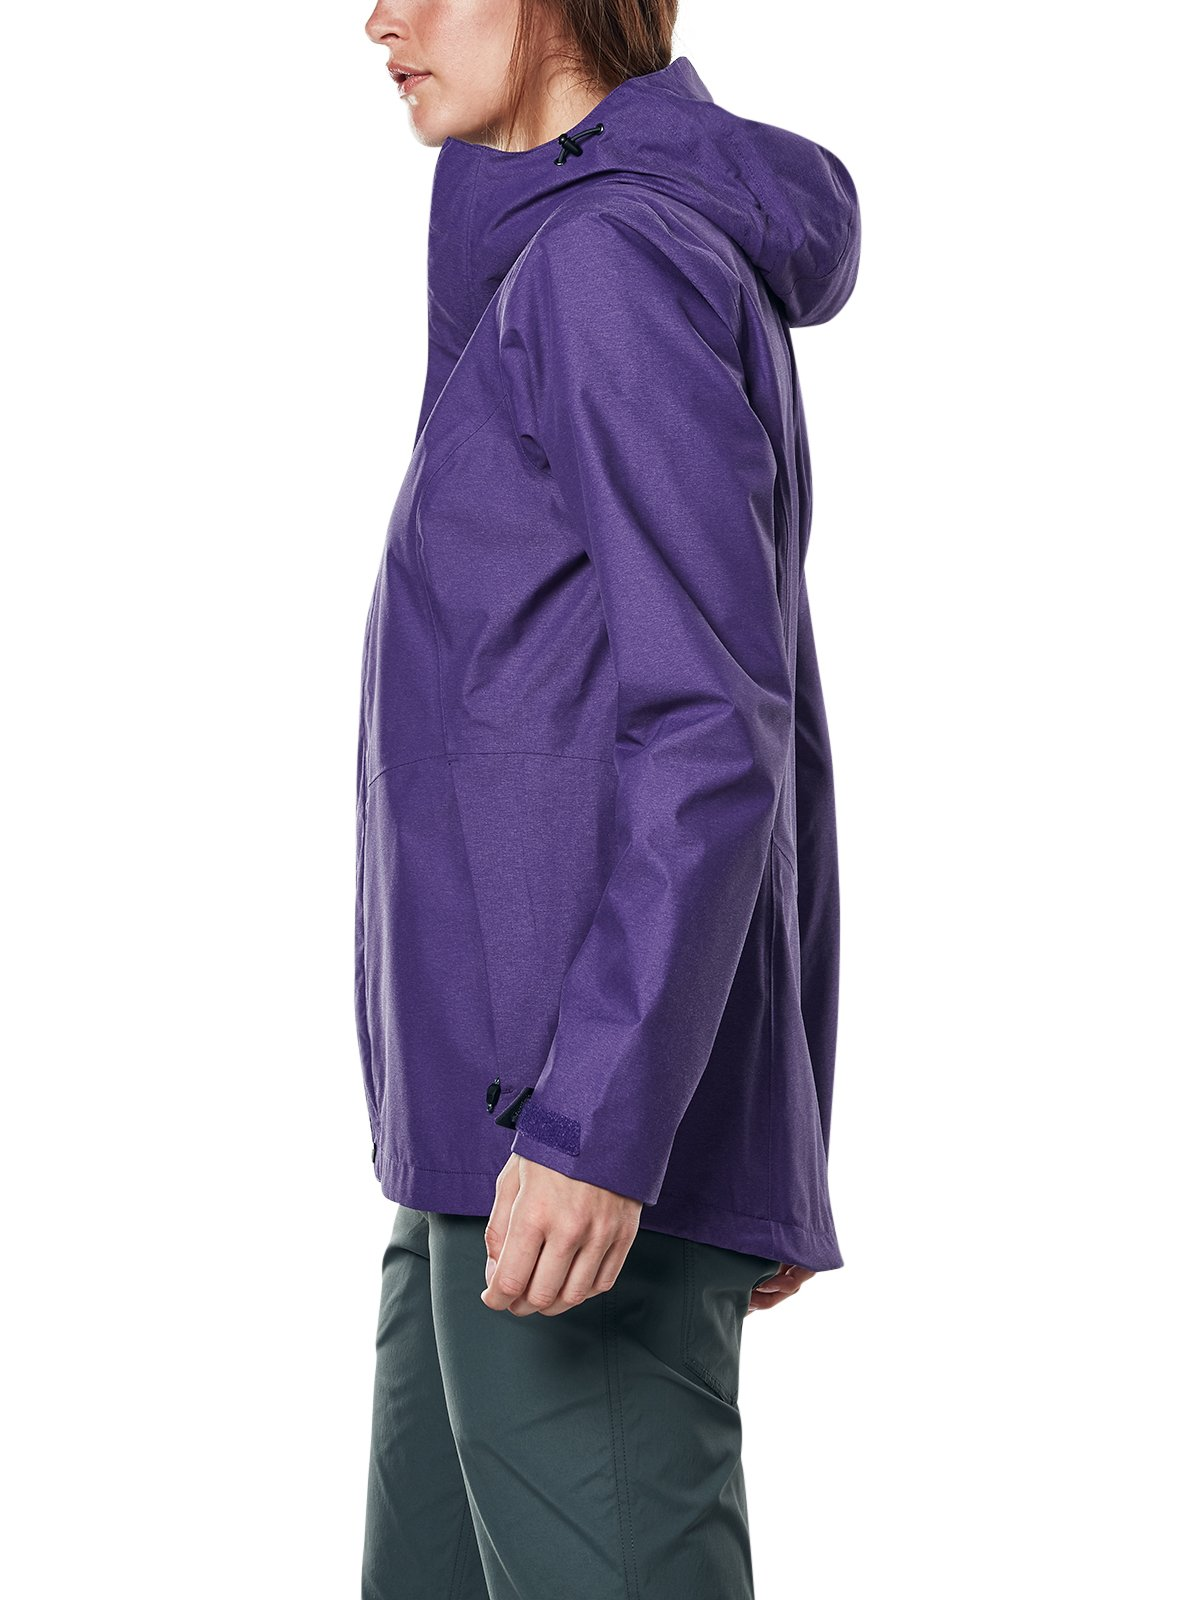 717NwSH%2BgeL - Berghaus Women's Elara Waterproof Jacket